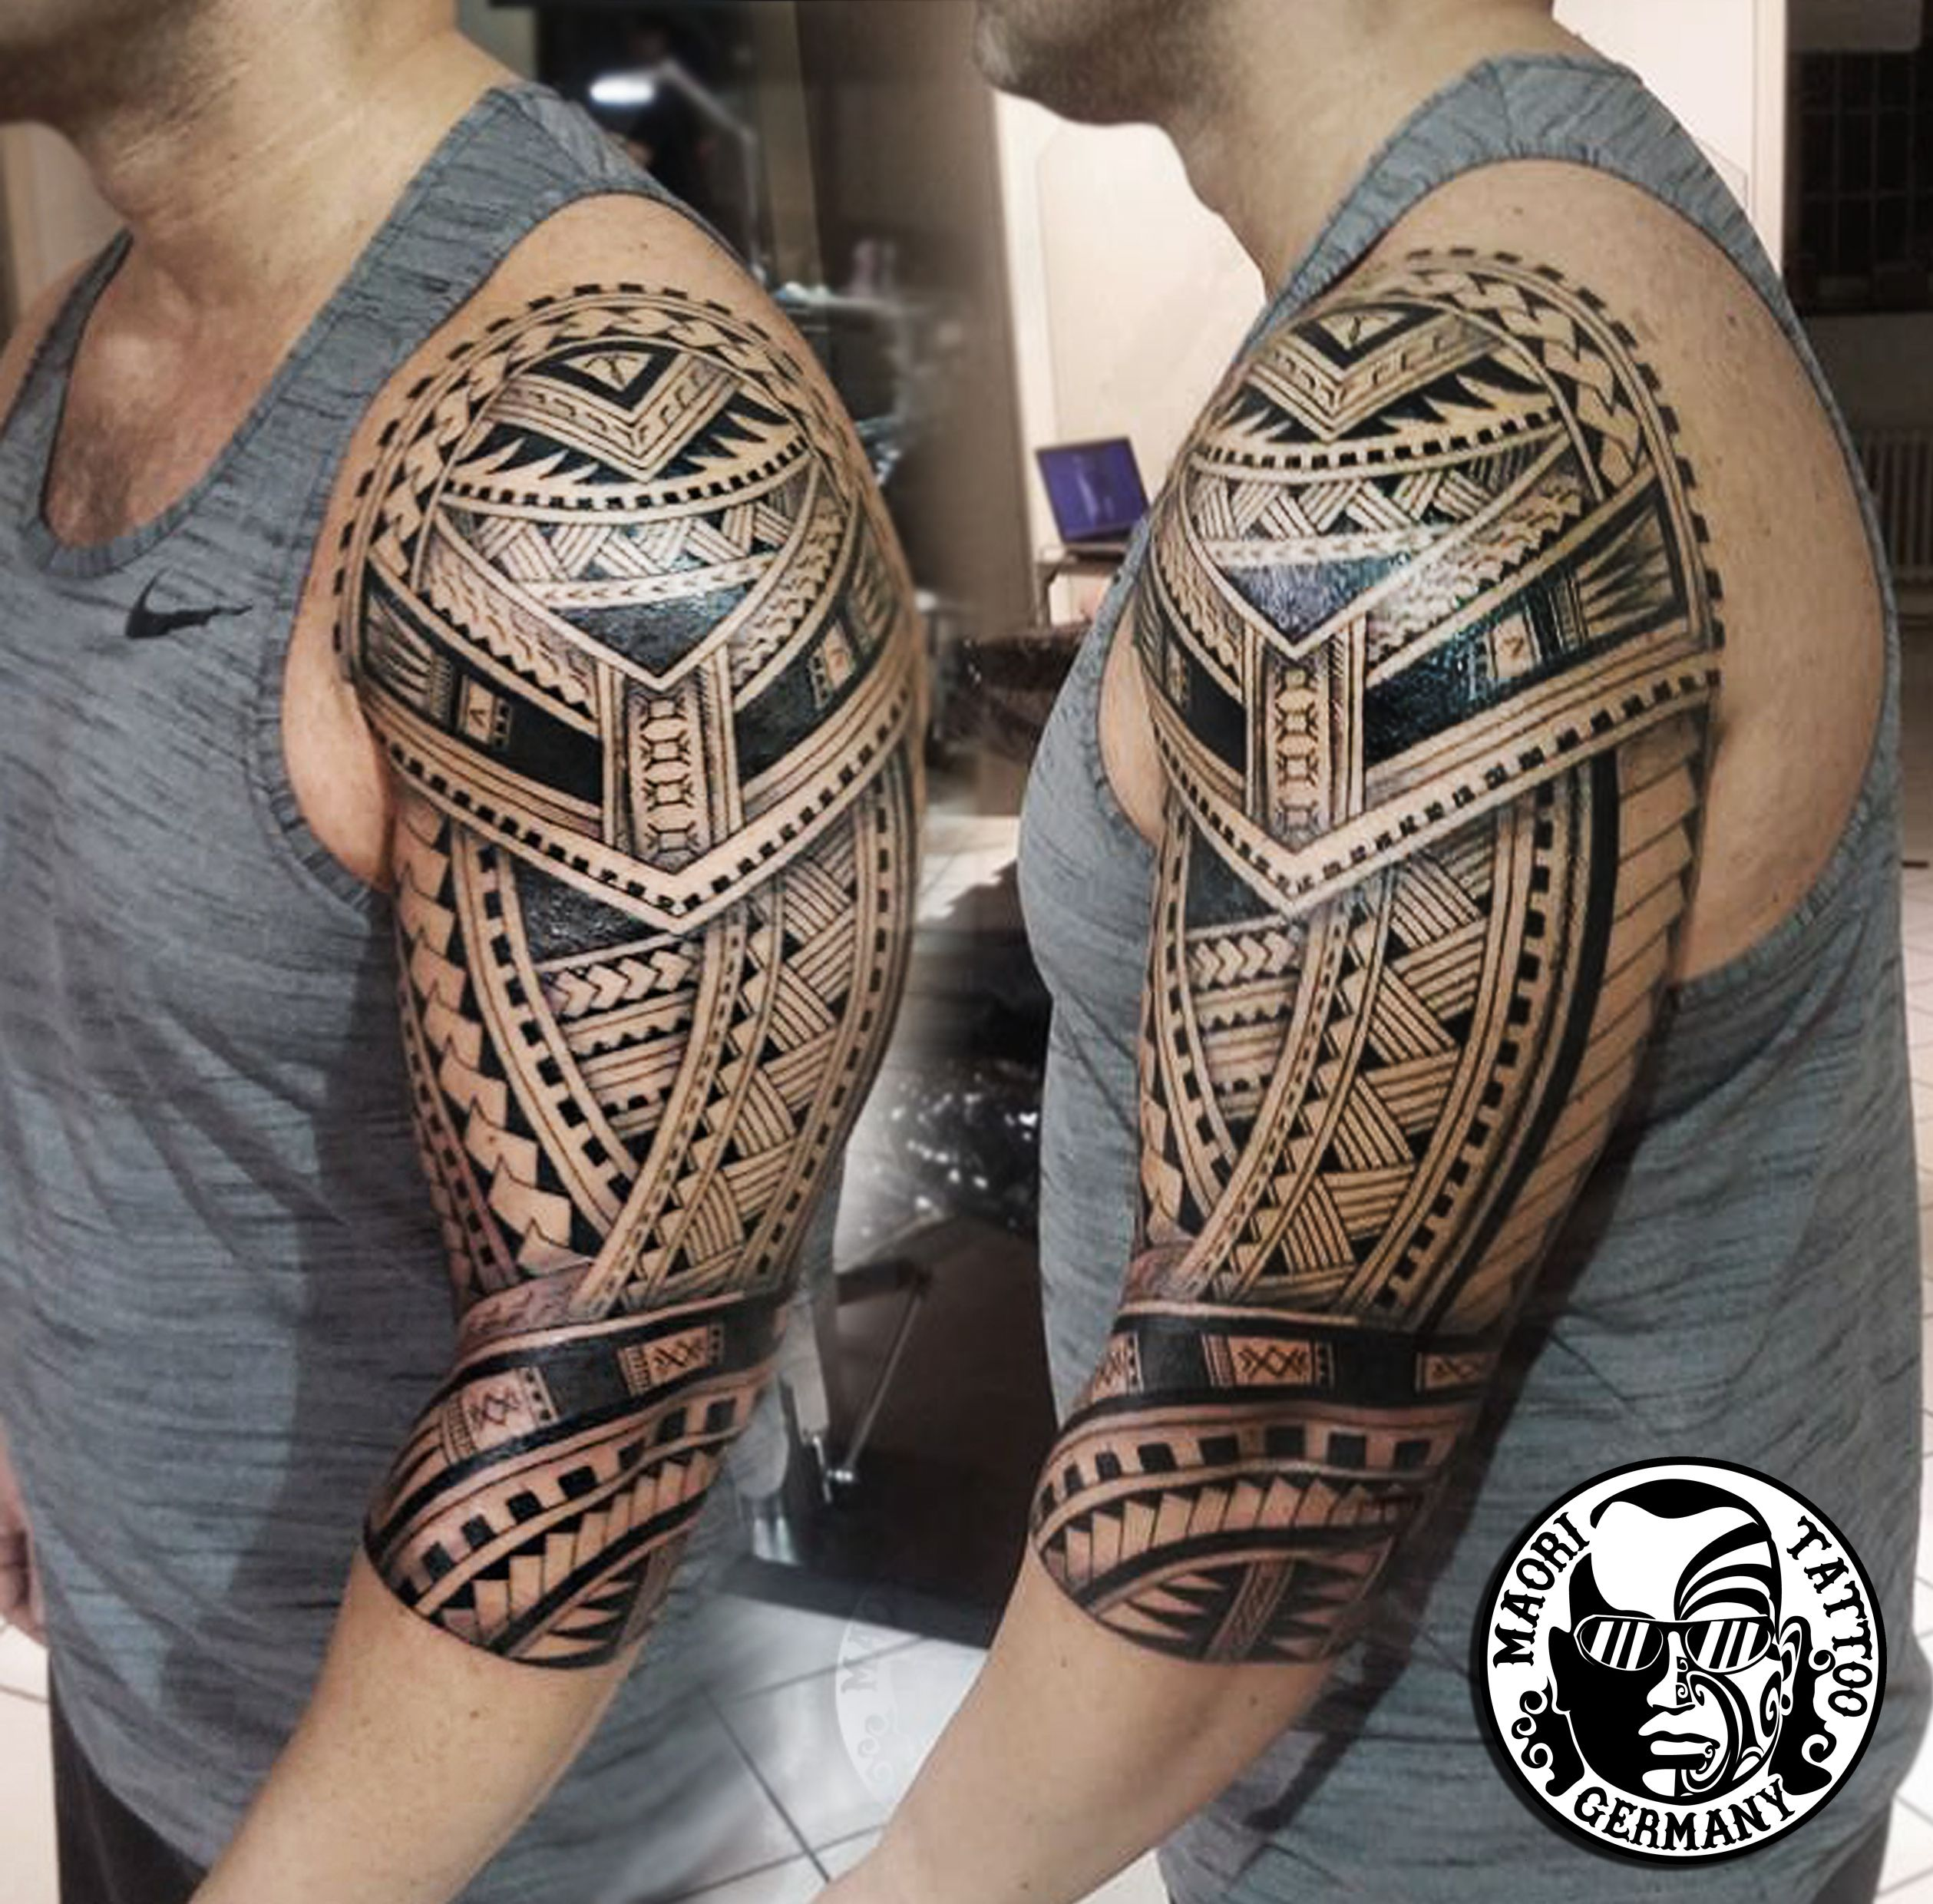 maori polinesische tattoos by mata tattoo studio art makia maori tattoo germany maori. Black Bedroom Furniture Sets. Home Design Ideas